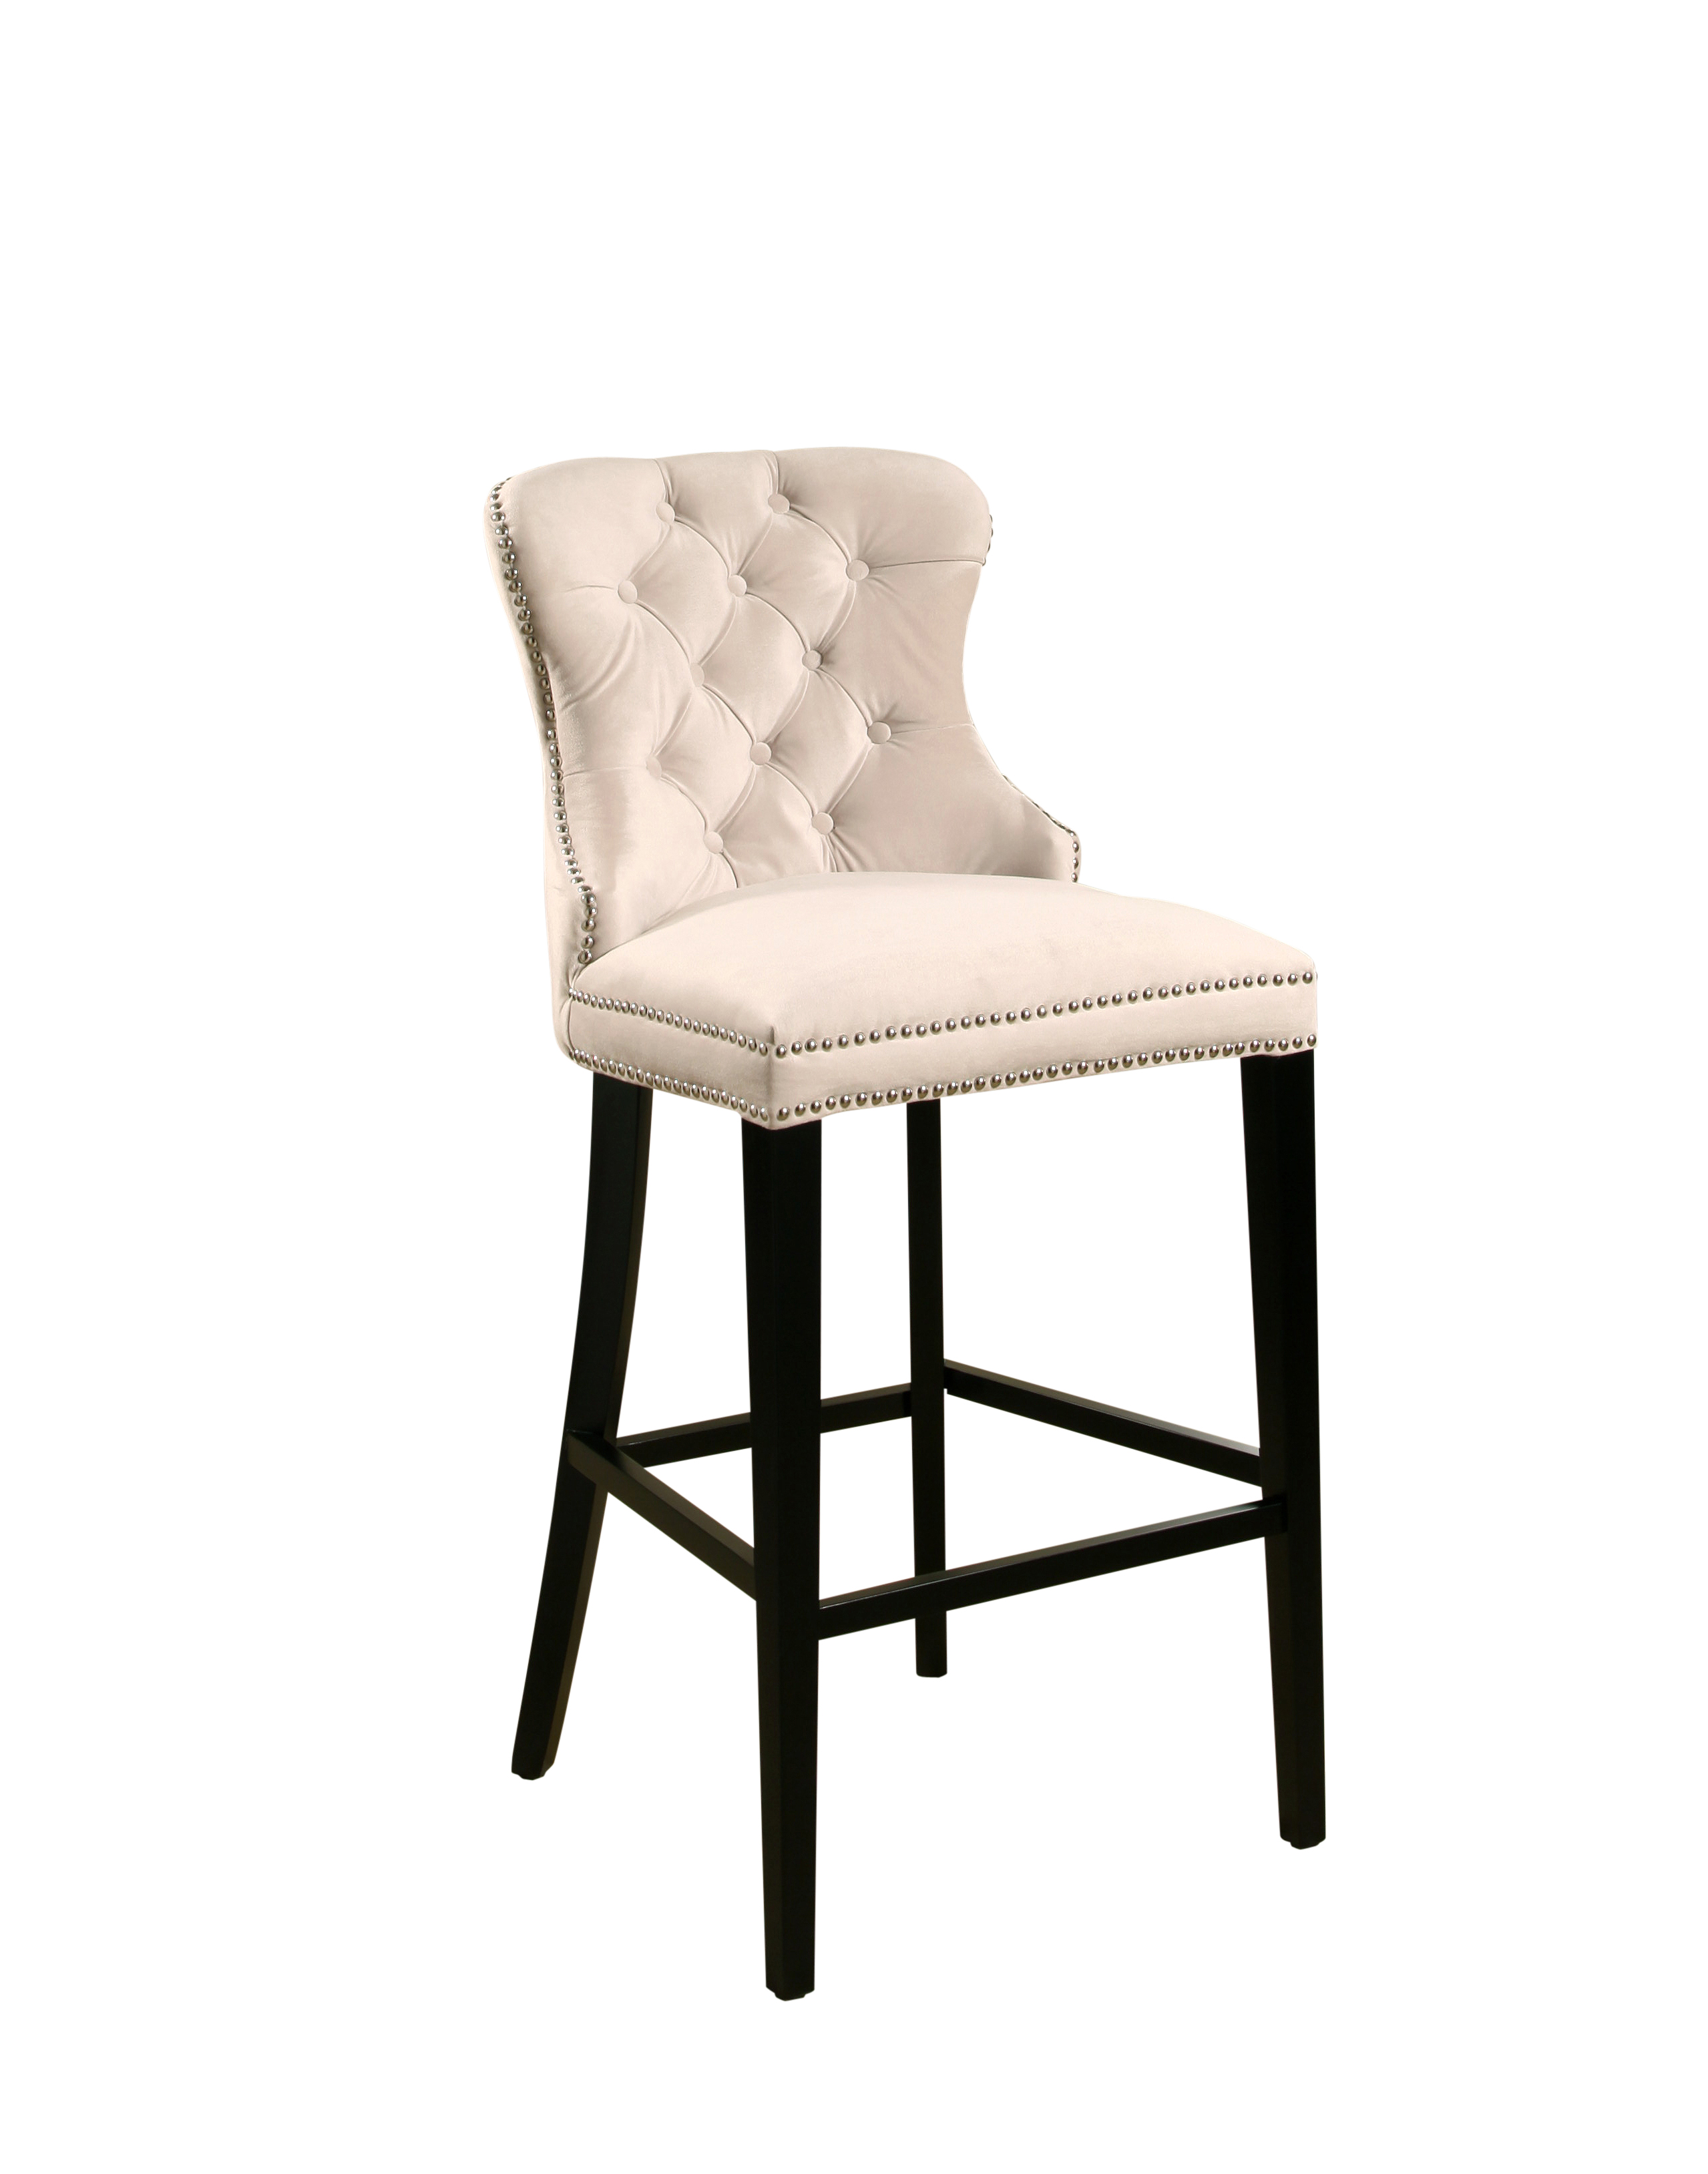 Abbyson Versailles bar stool